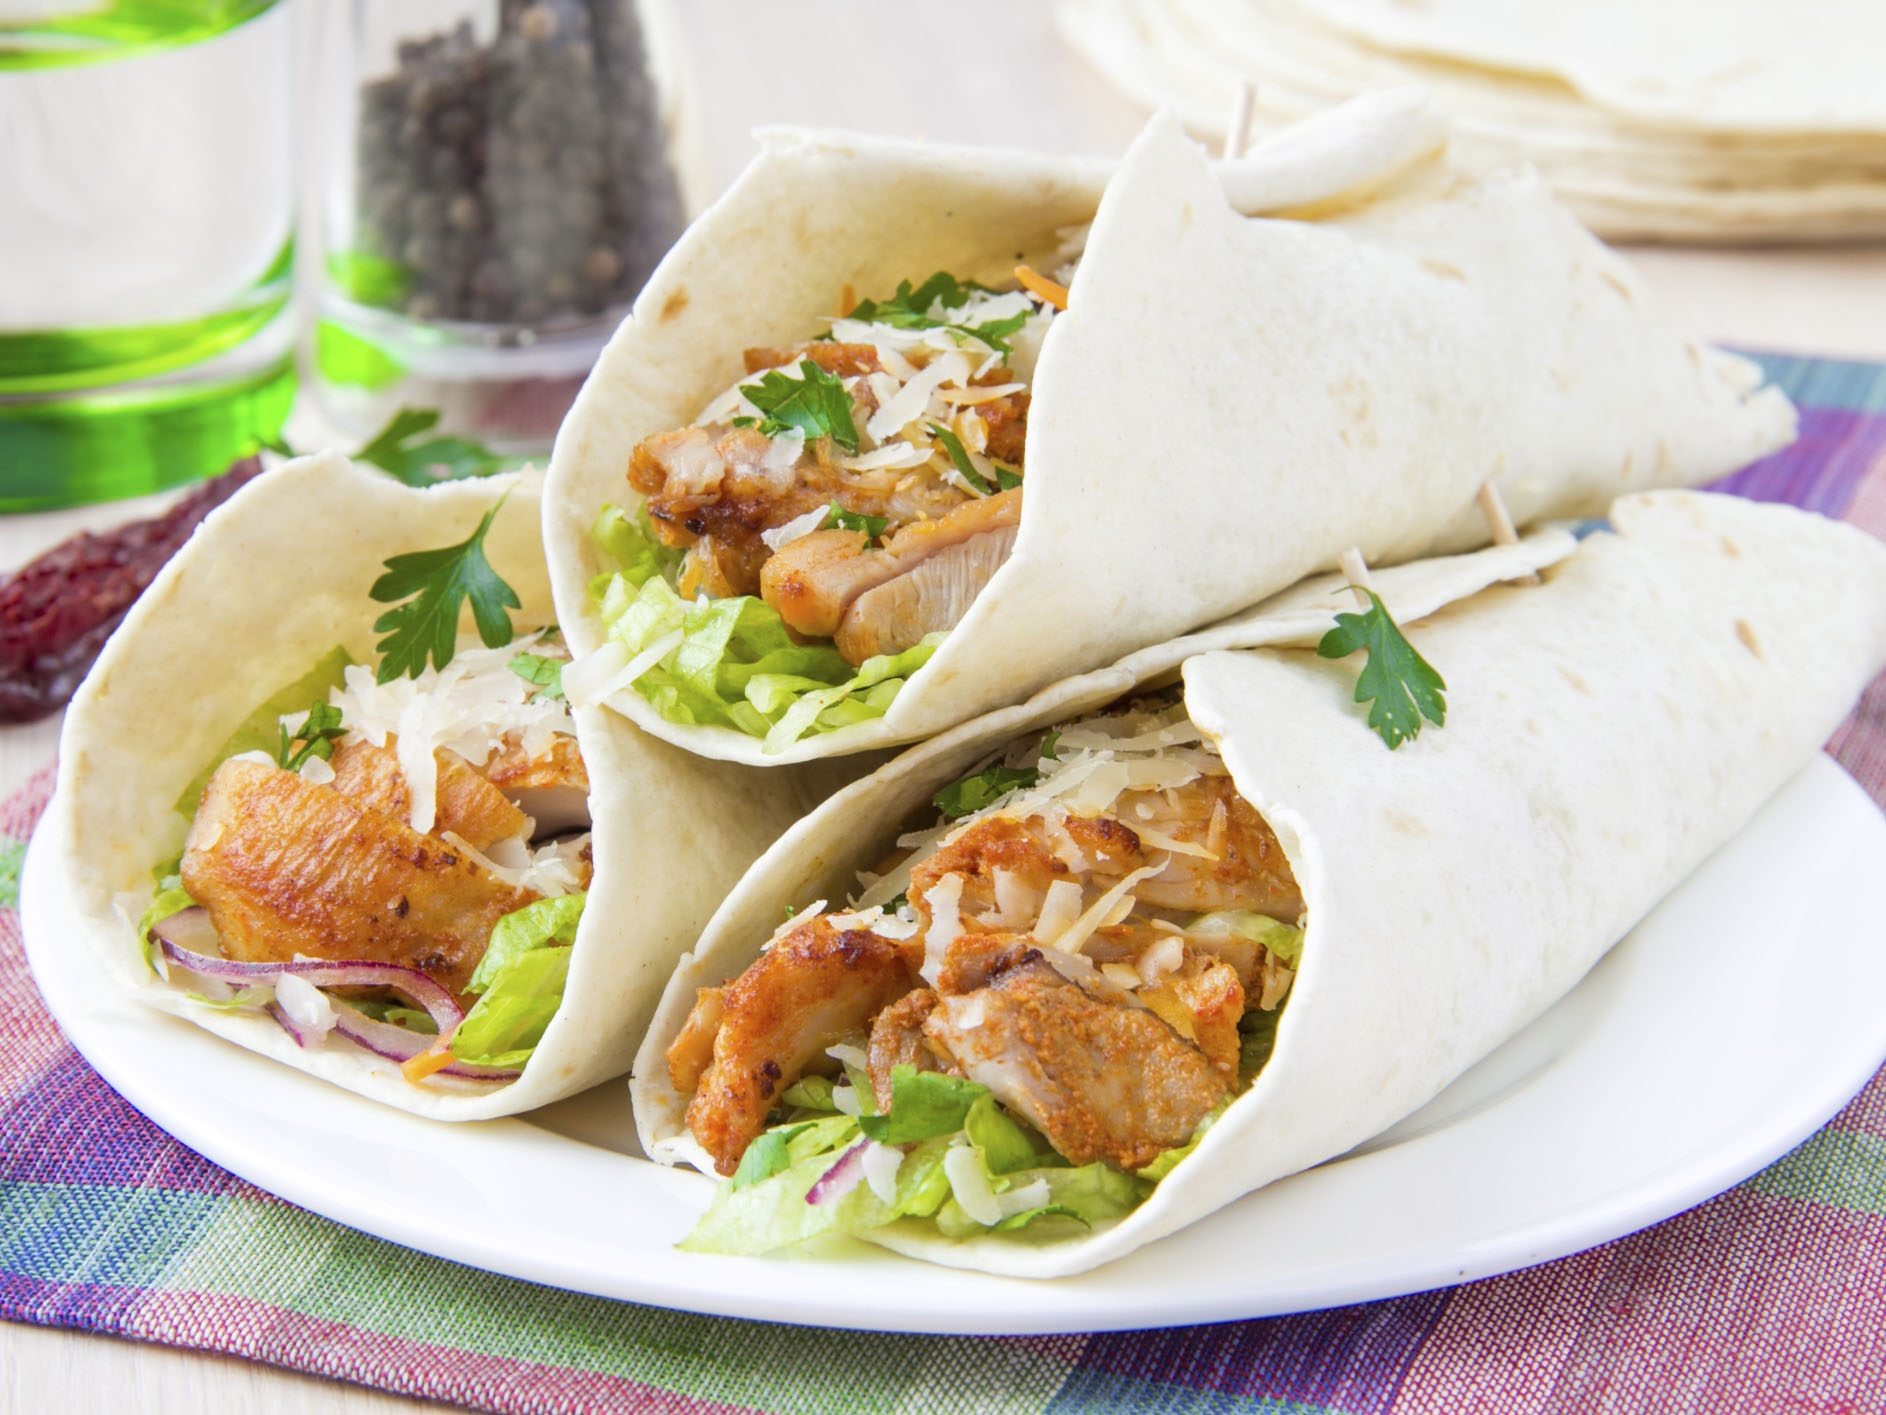 Recipe: Chicken Fajitas with Goat's Cheese